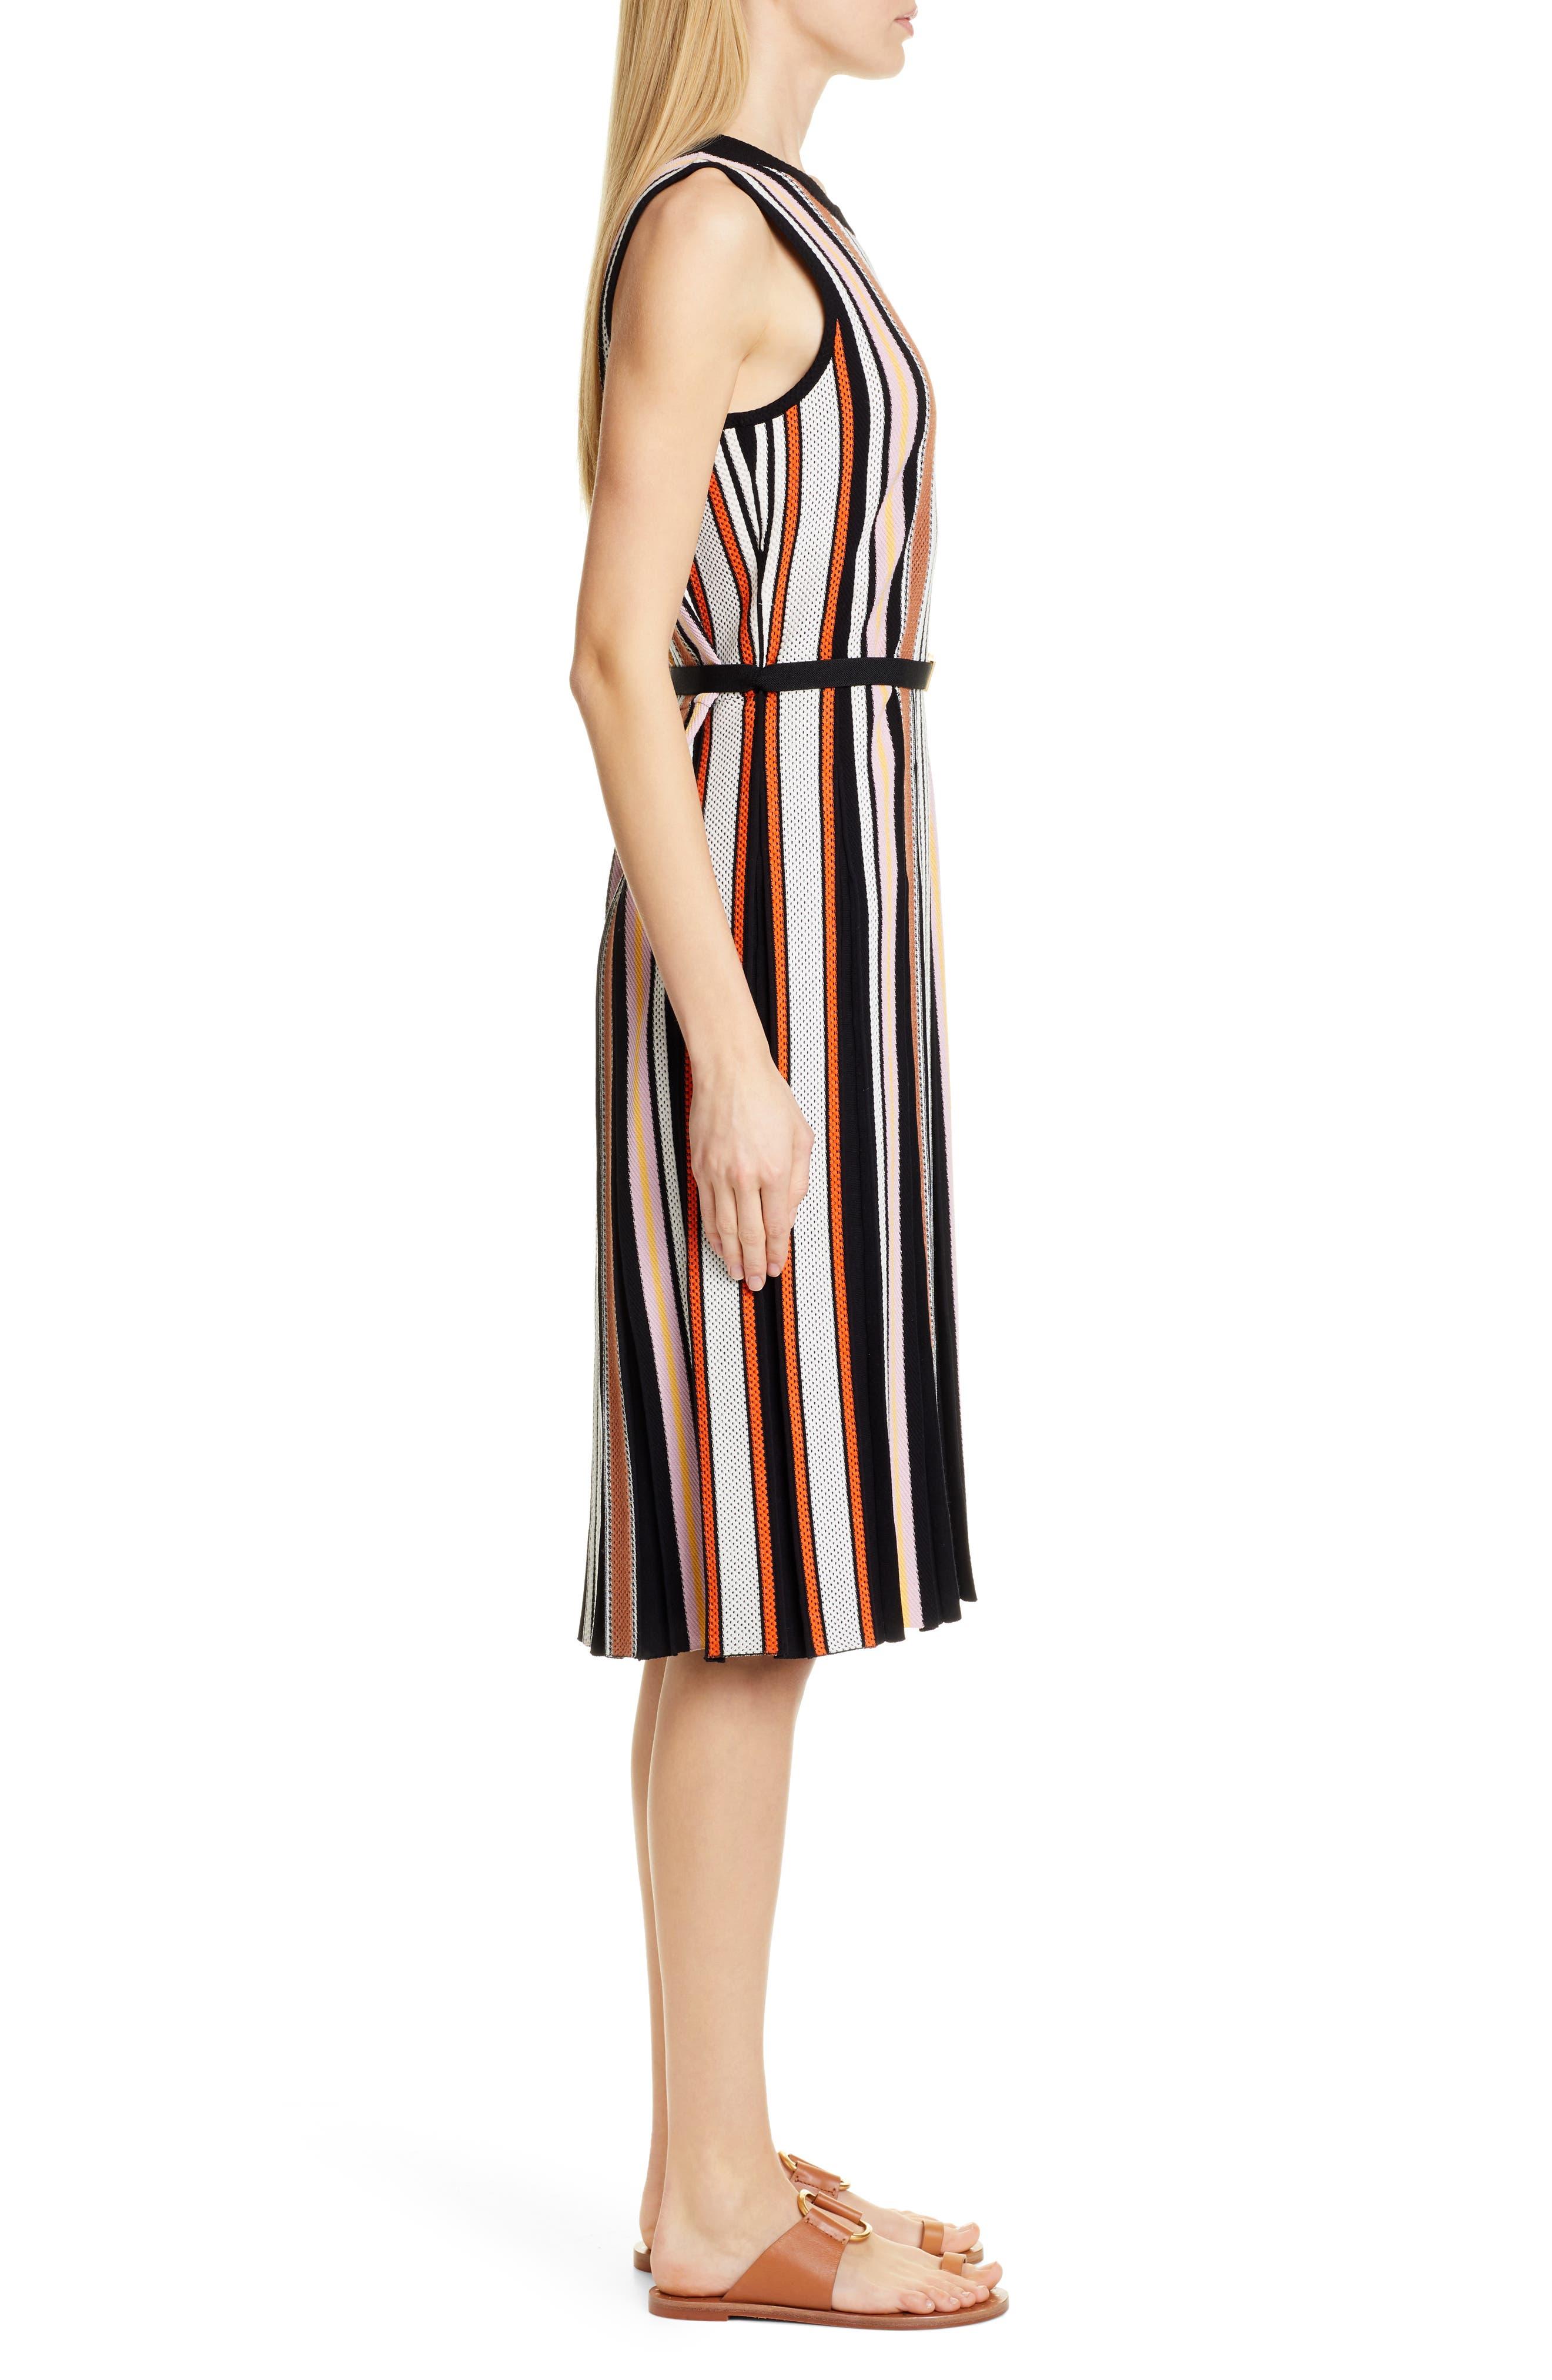 TORY BURCH, Stripe Sweater Dress, Alternate thumbnail 3, color, WEBBING STRIPE